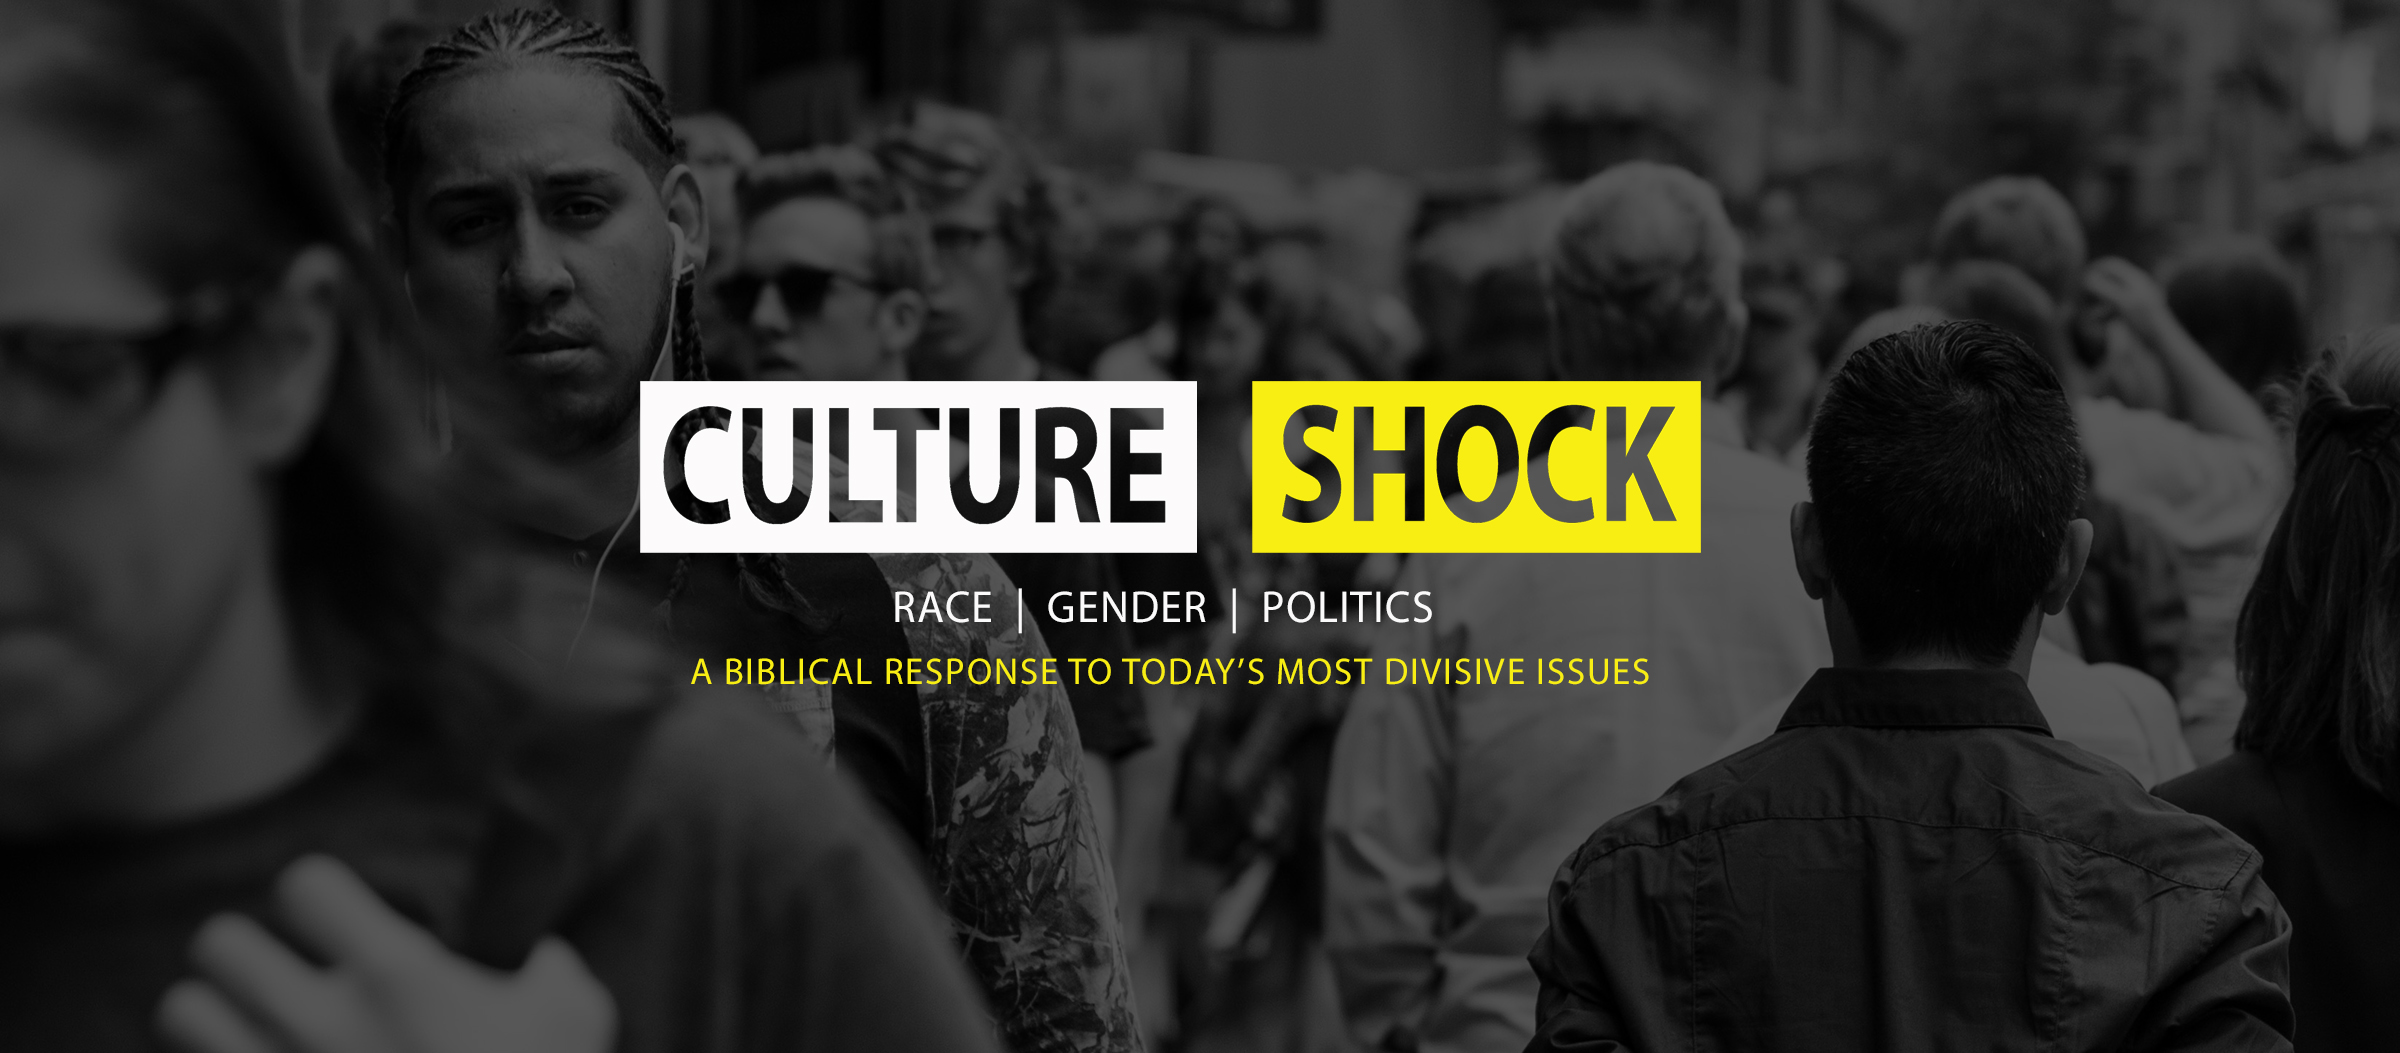 culture-SHOCK-web-question-page.jpg